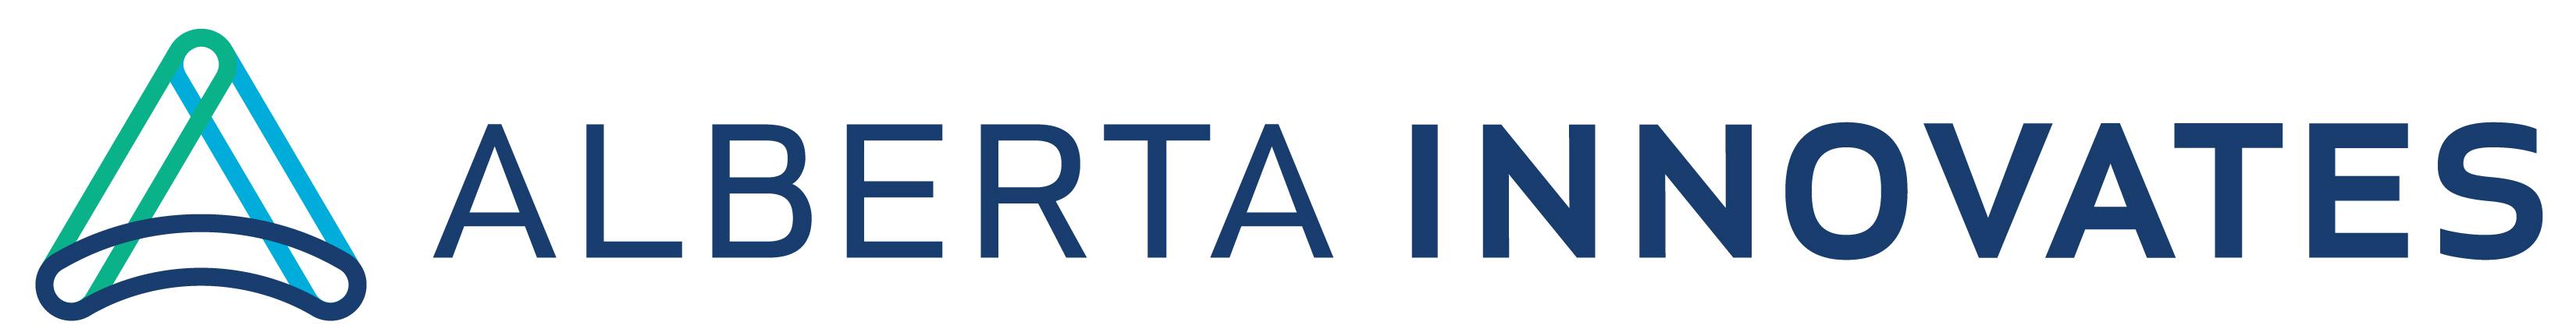 Image result for alberta innovates logo